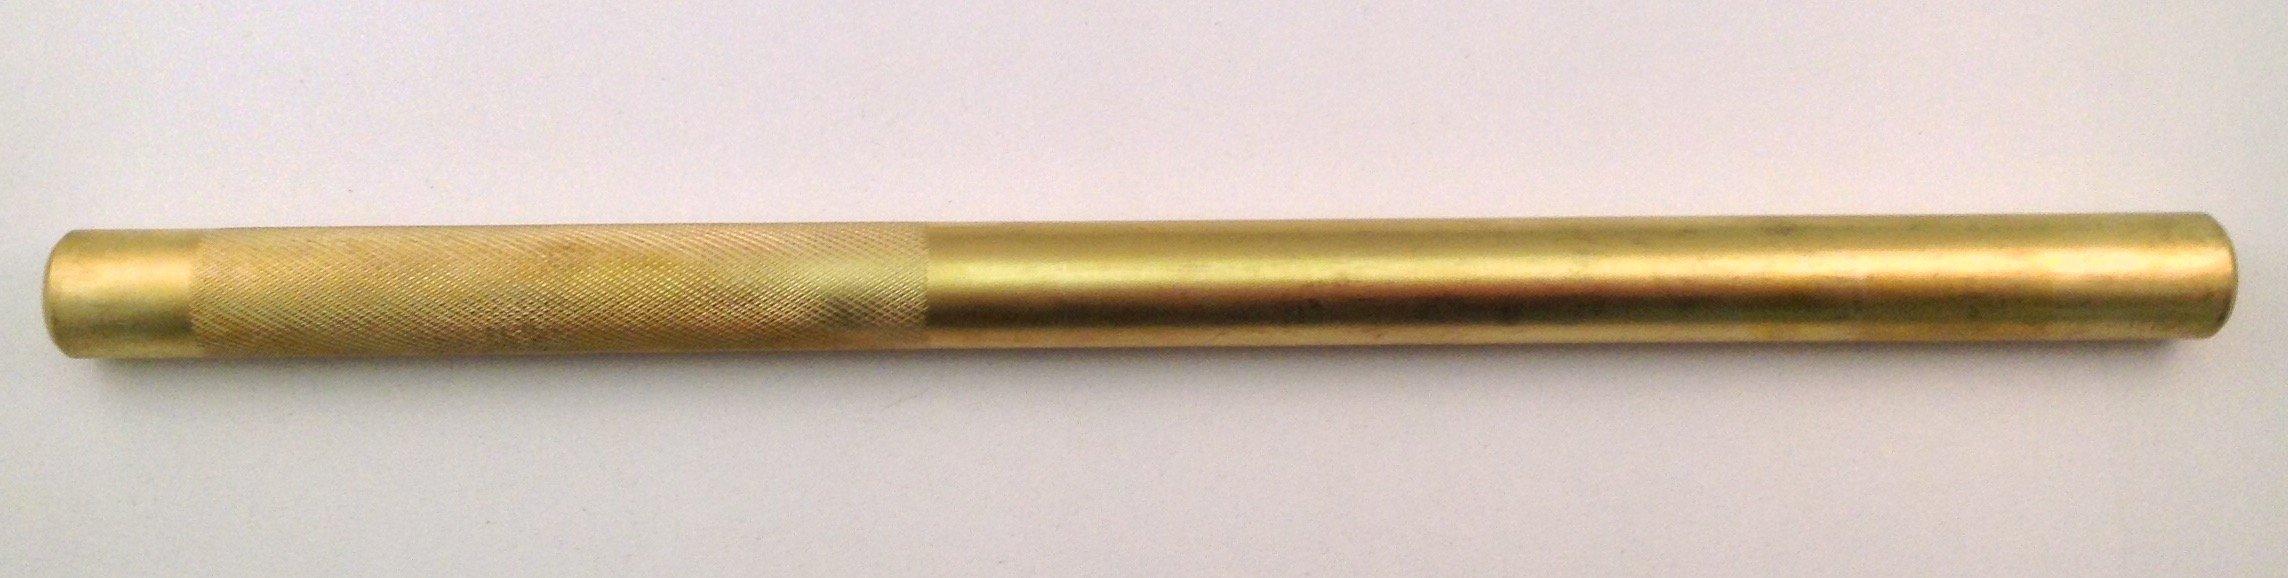 Solid Brass Drift Punch 3/4'' x 11 3/4'' Hand Punch